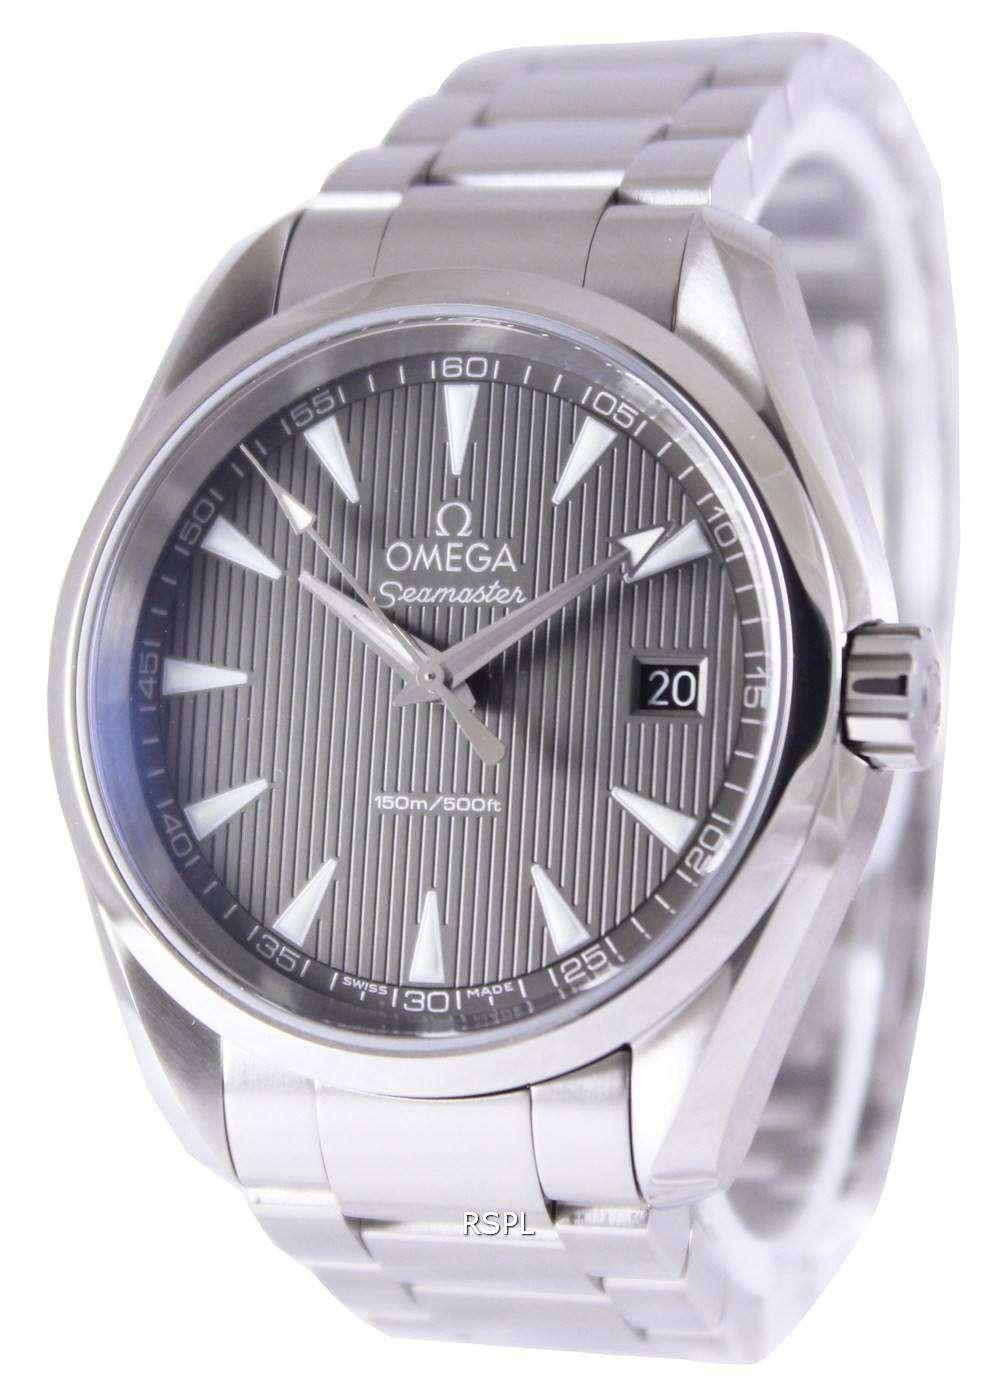 Omega Seamaster Aqua Terra Grey Dial 231 10 39 60 06 001